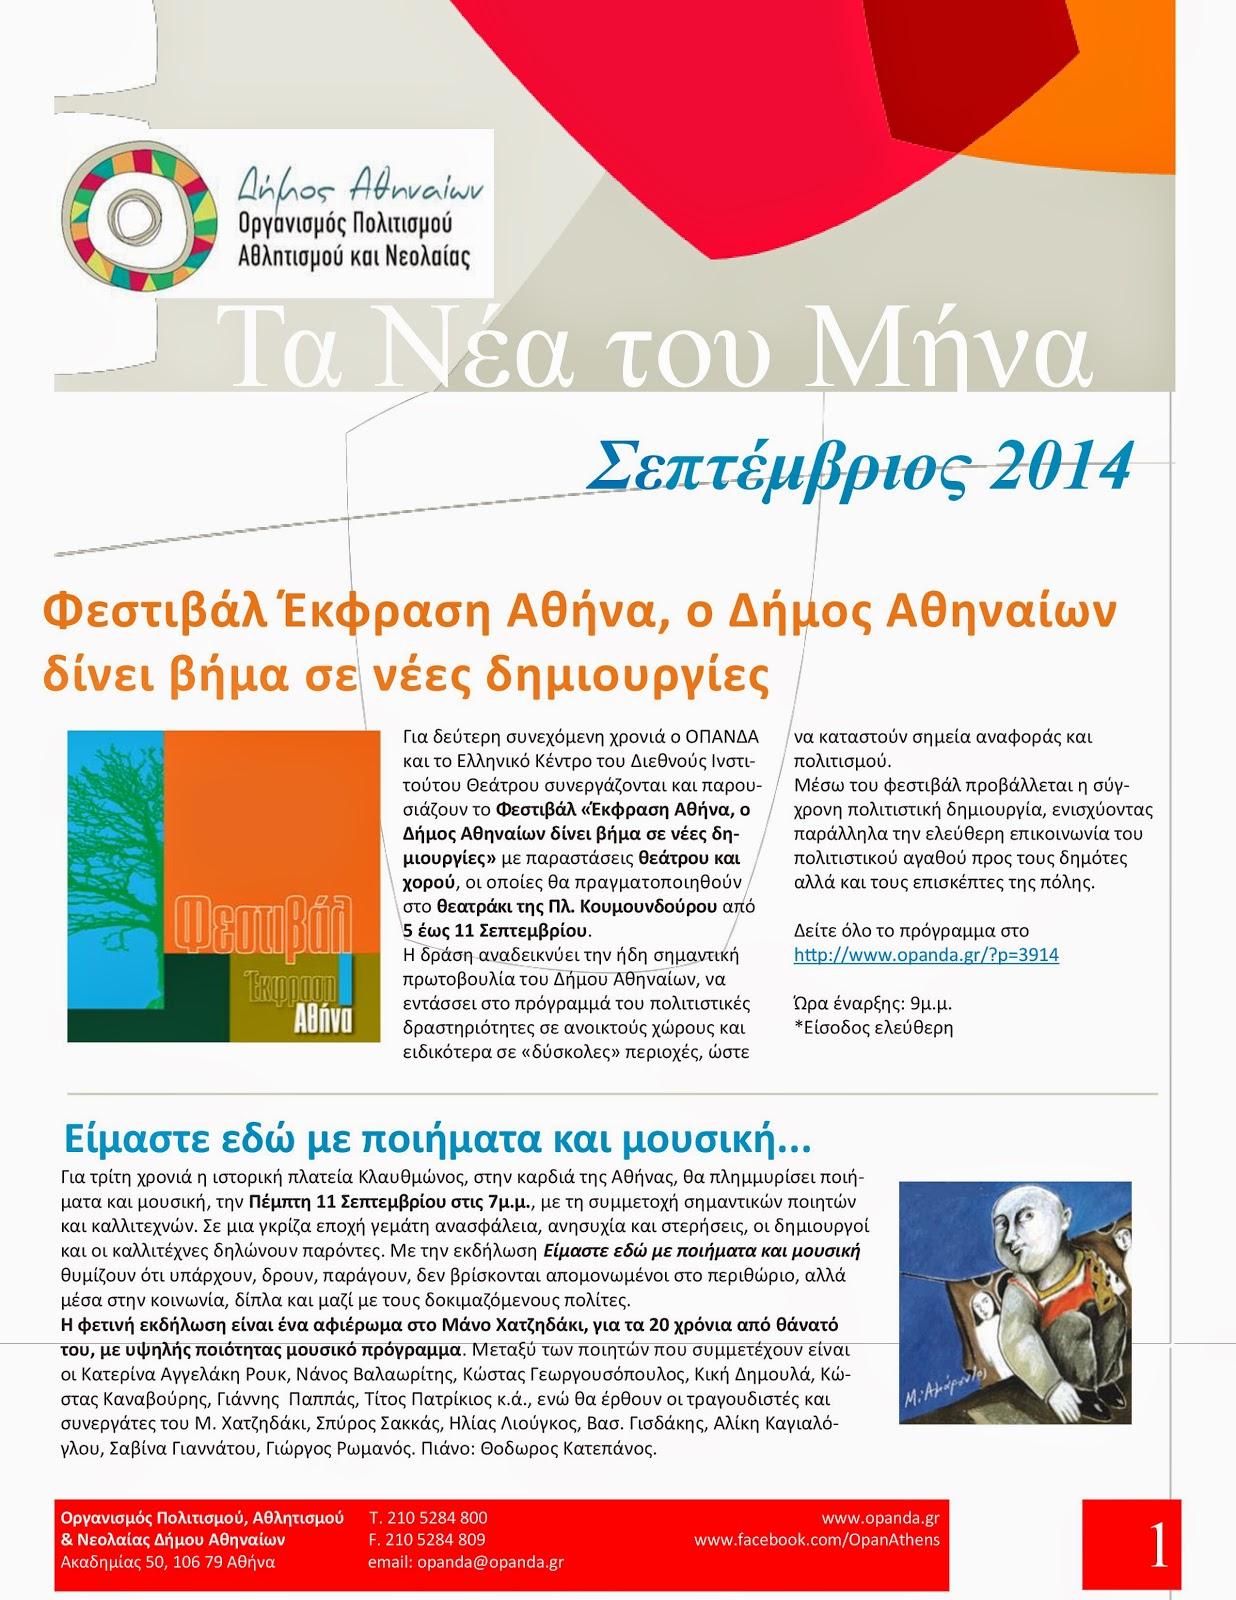 0e4b1c054c1 Οργανισμός Πολιτισμού, Αθλητισμού και Νεολαίας Δήμου Αθηναίων - ΟΠΑΝΔΑ  Σεπτέμβρης 2014